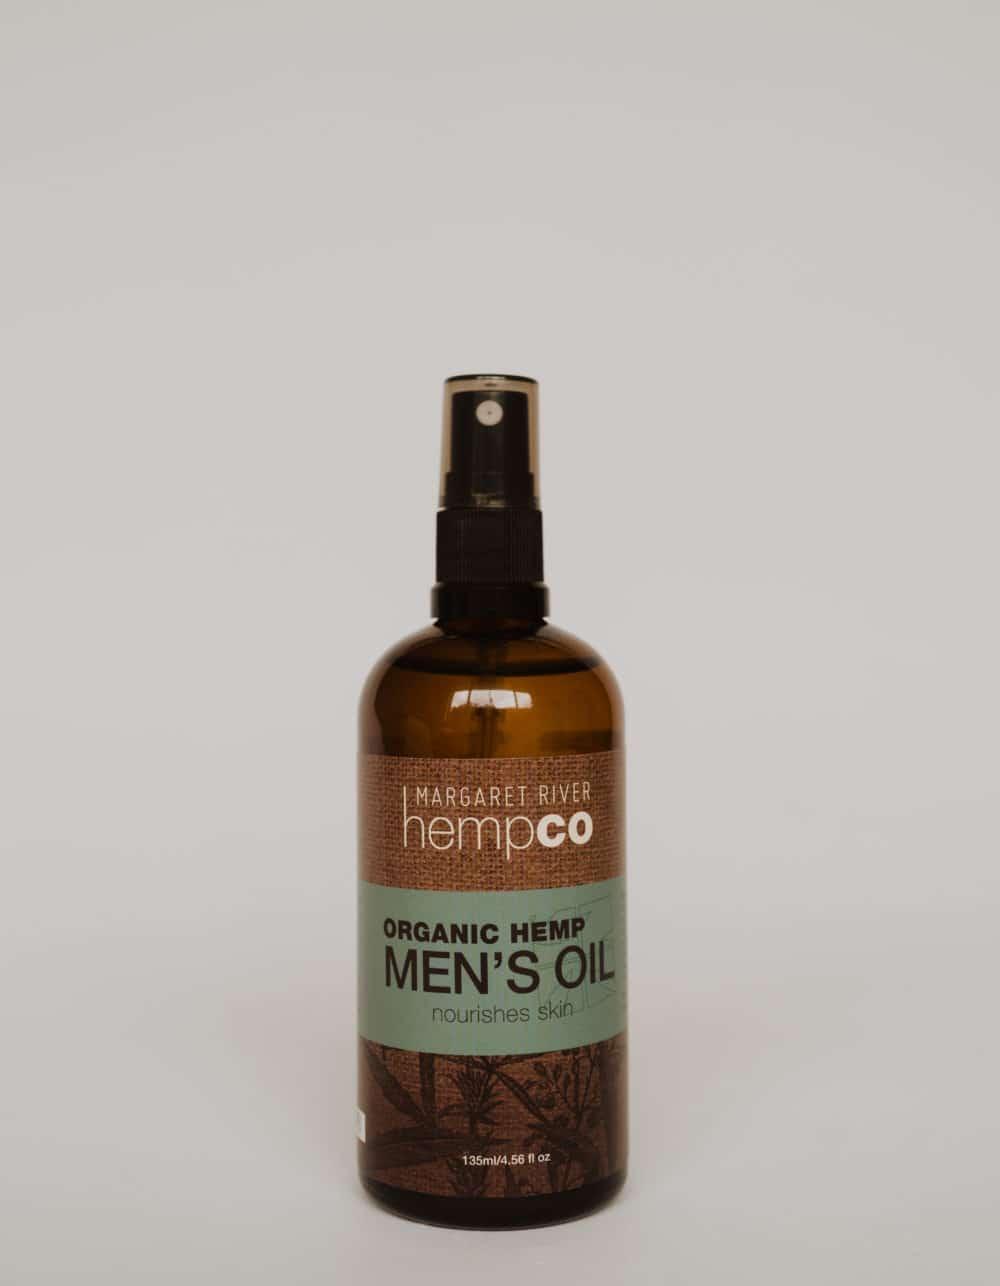 Organic Hemp Men's Massage Oil